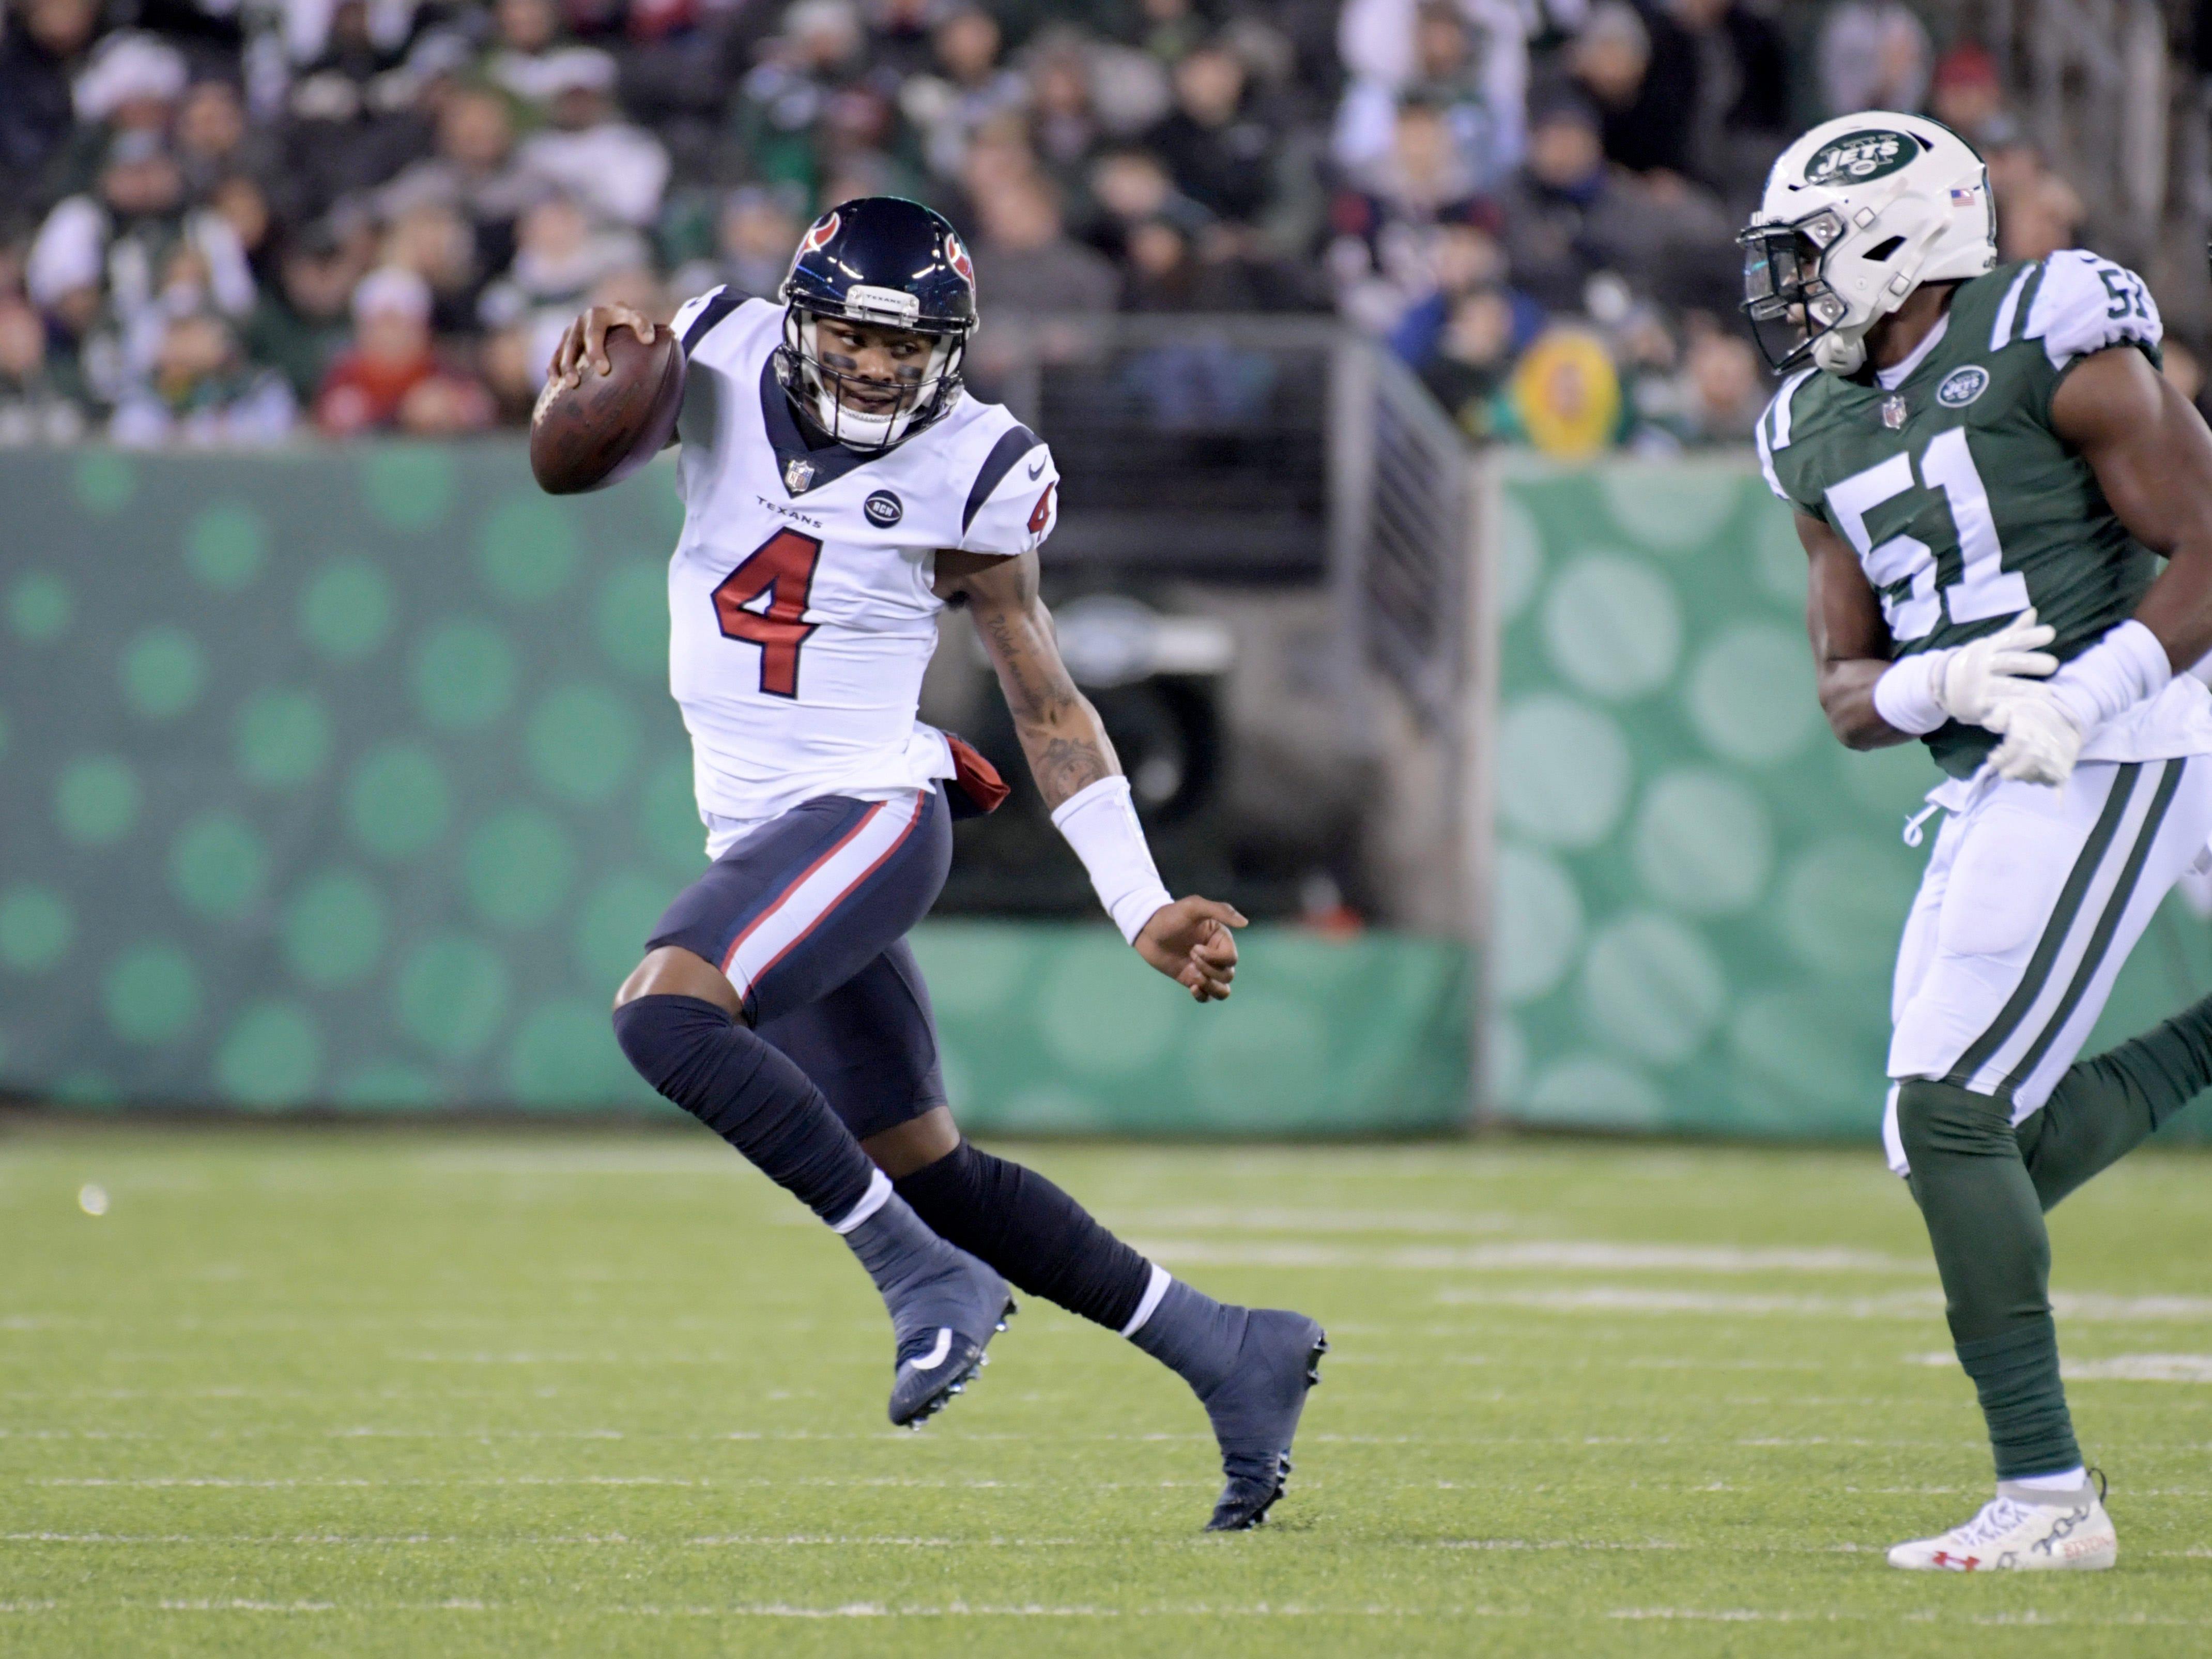 Houston Texans quarterback Deshaun Watson (4) runs from New York Jets outside linebacker Brandon Copeland (51) during the first half at MetLife Stadium.